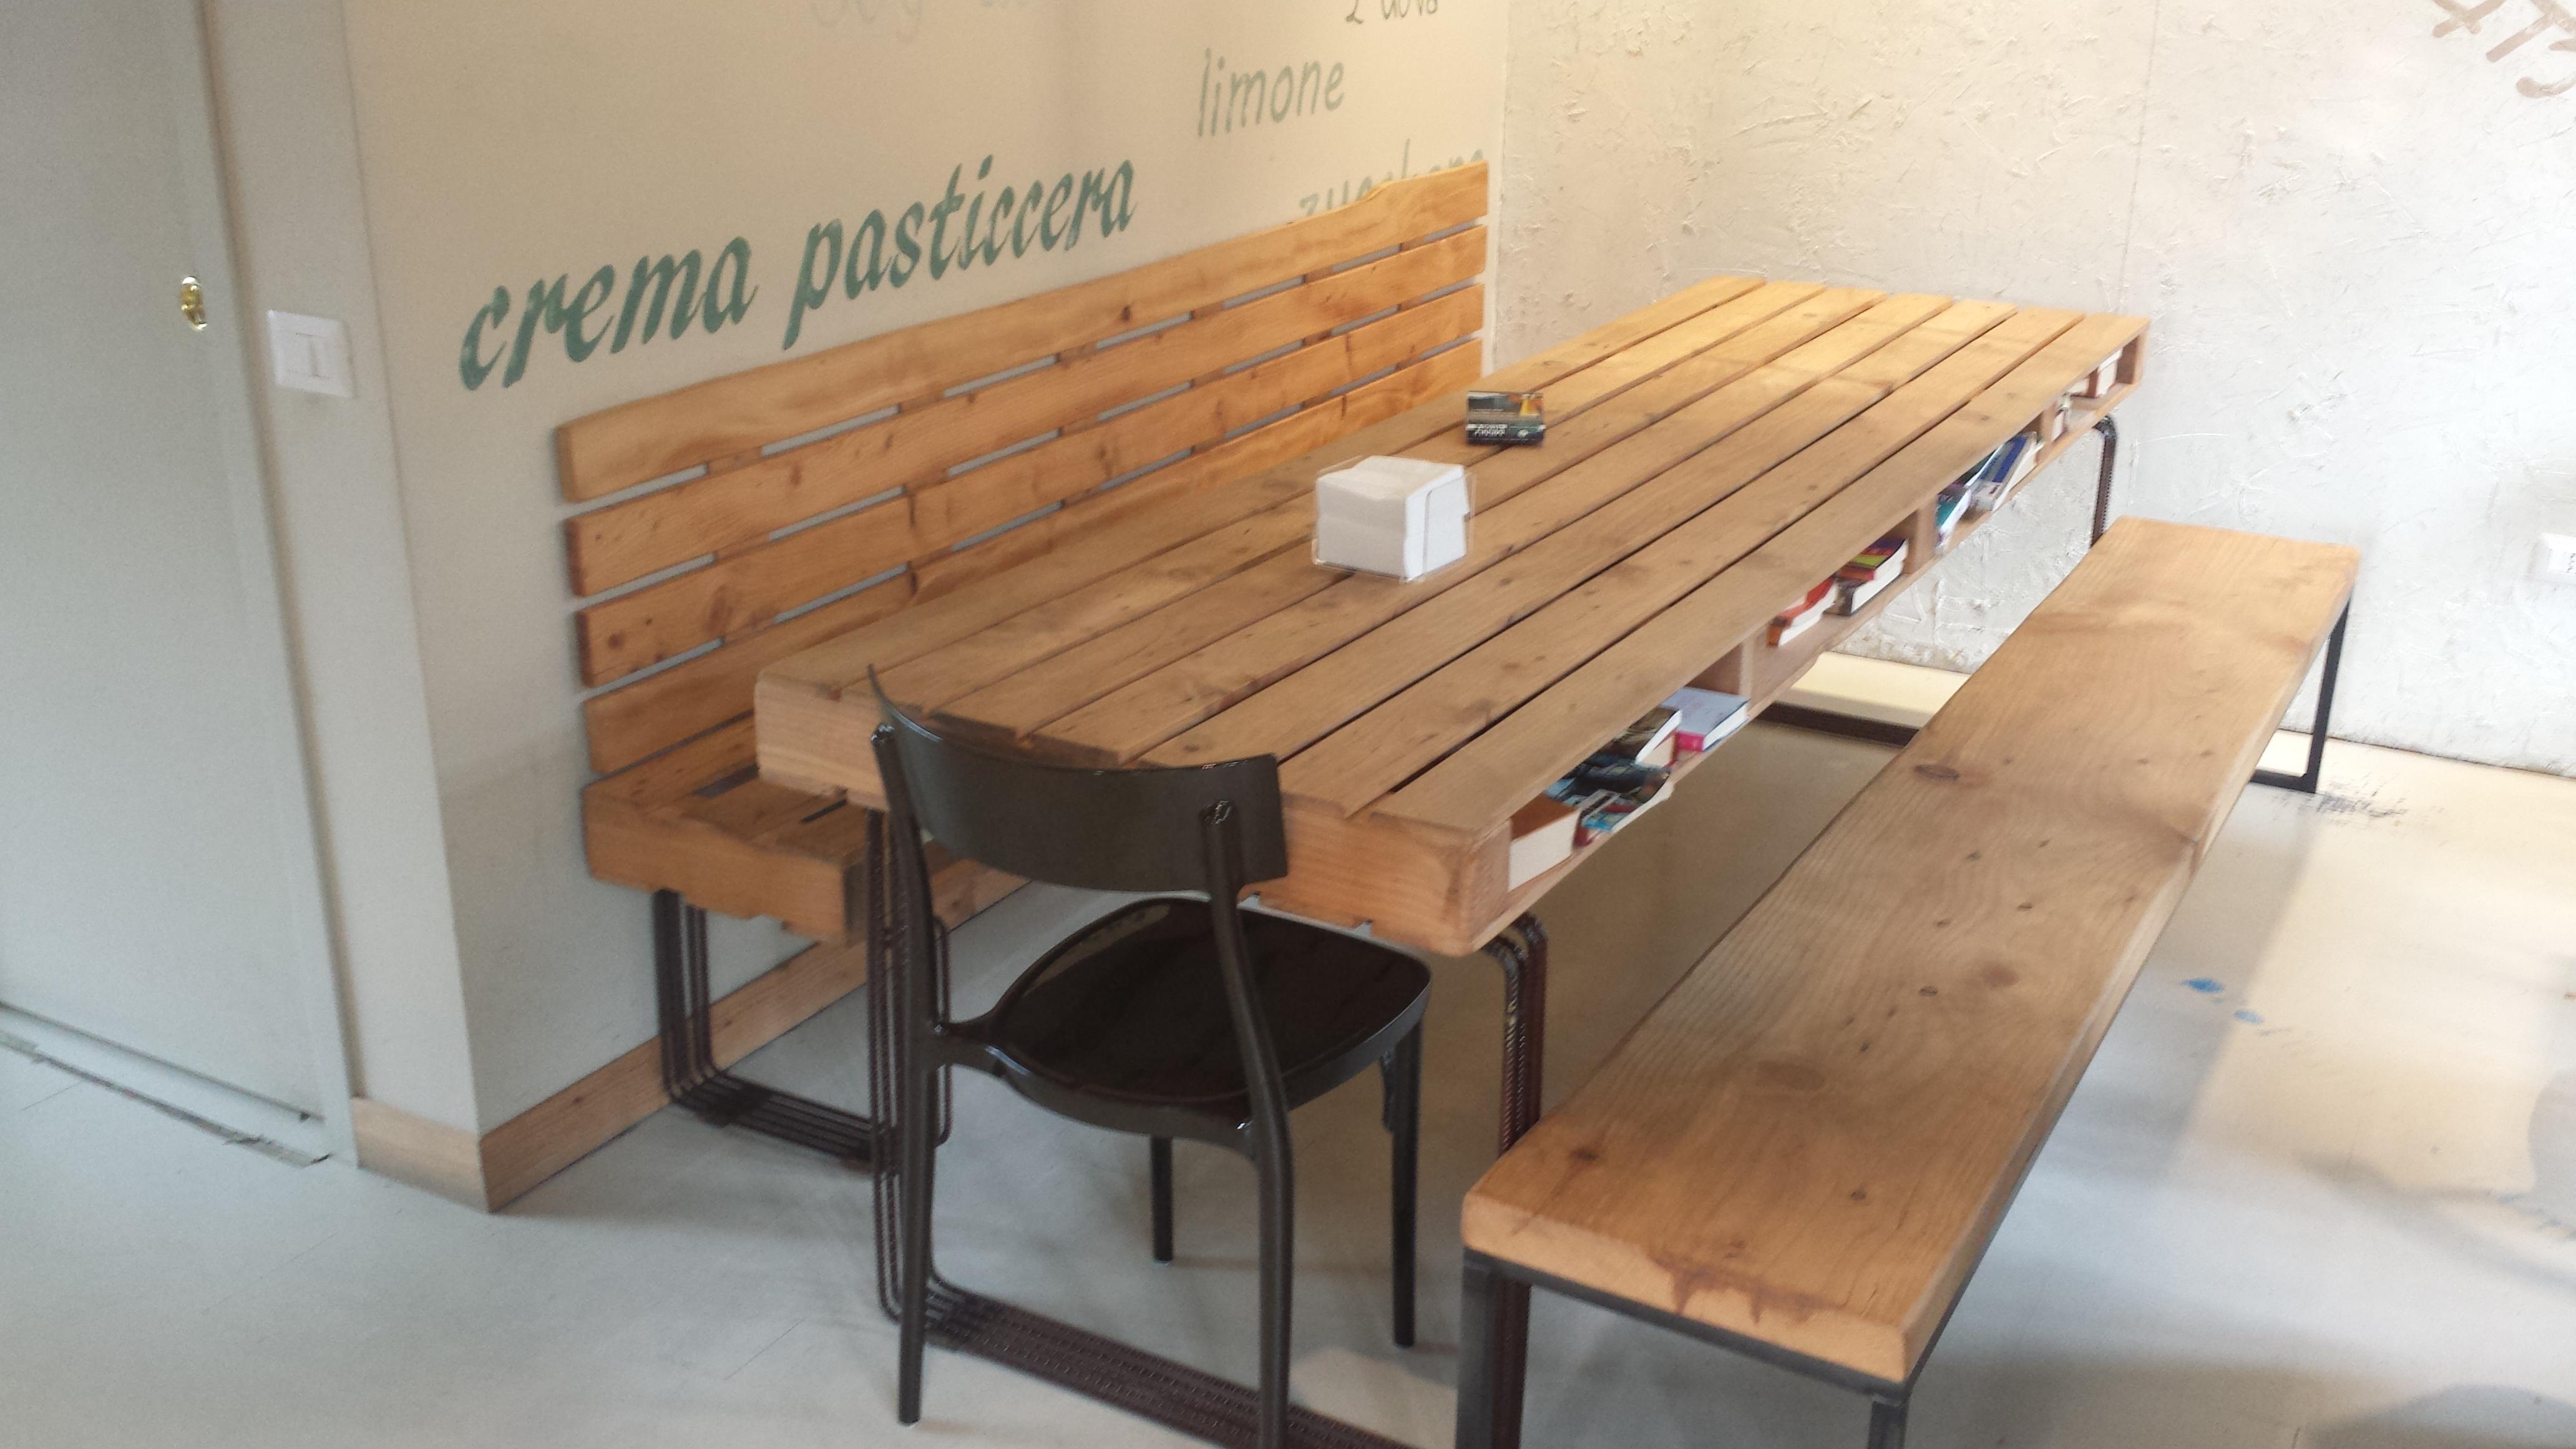 Tavoli con bancali di legno iz72 regardsdefemmes for Pallet idee arredo